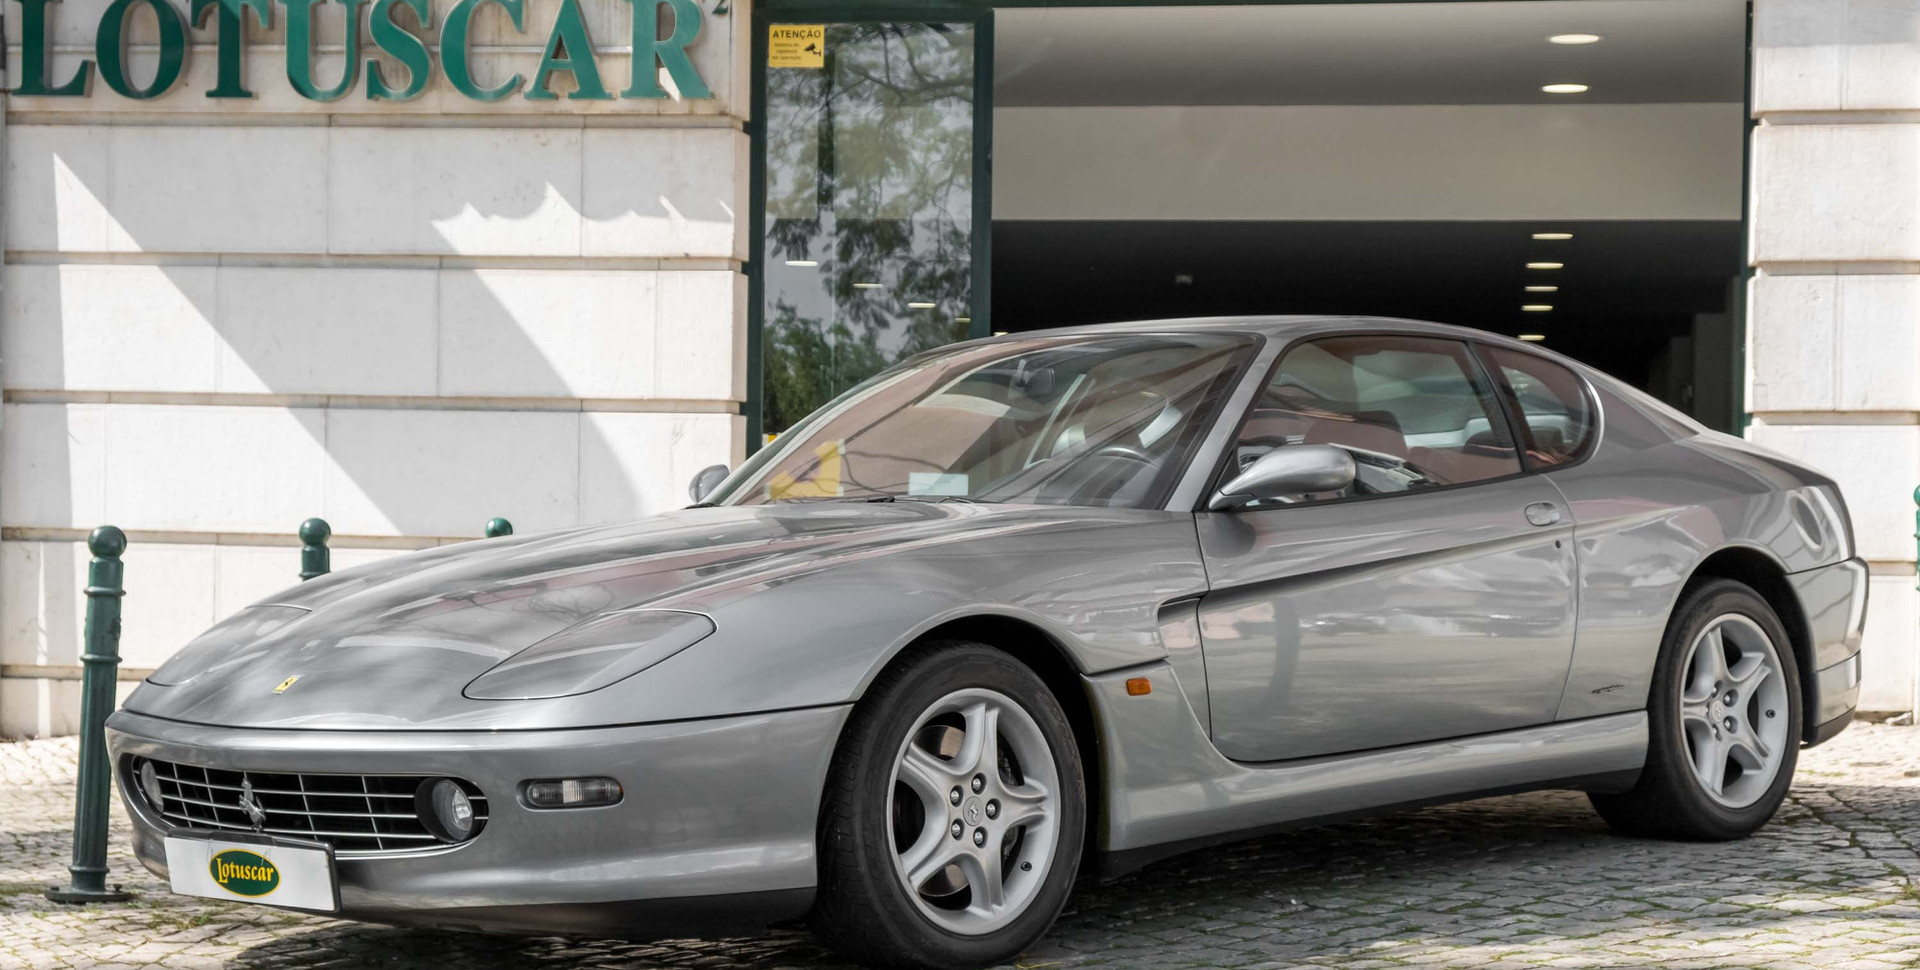 Ferrari 575M_-21.jpg